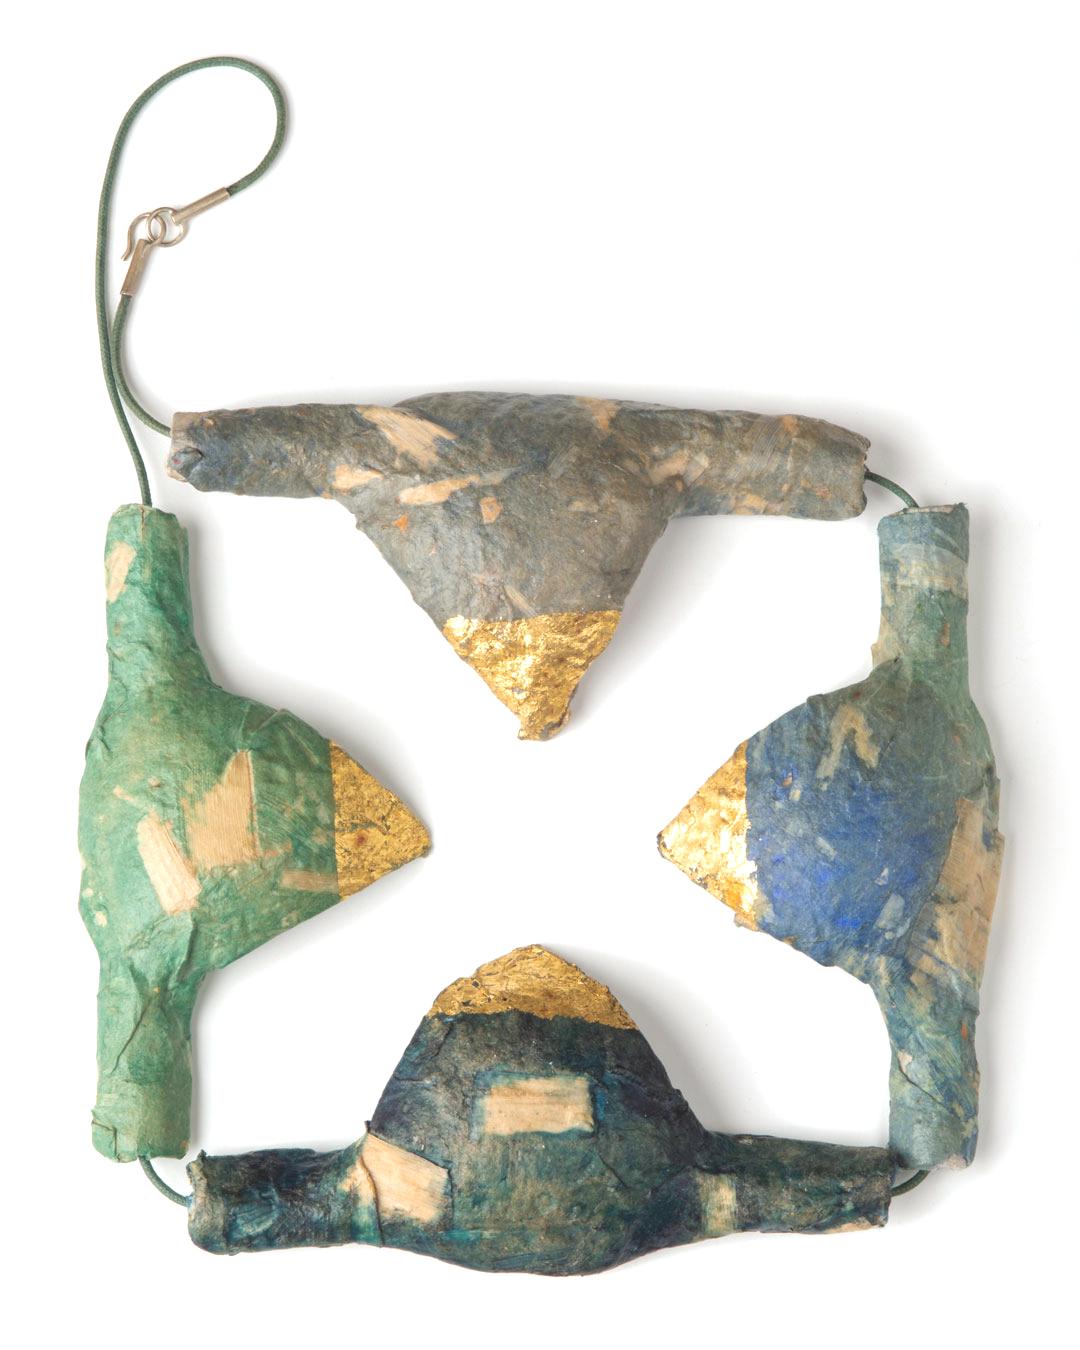 Margit Jäschke, untitled, 1991, necklace; paper, gold leaf, cord, 380 x 240 x 25, €3400